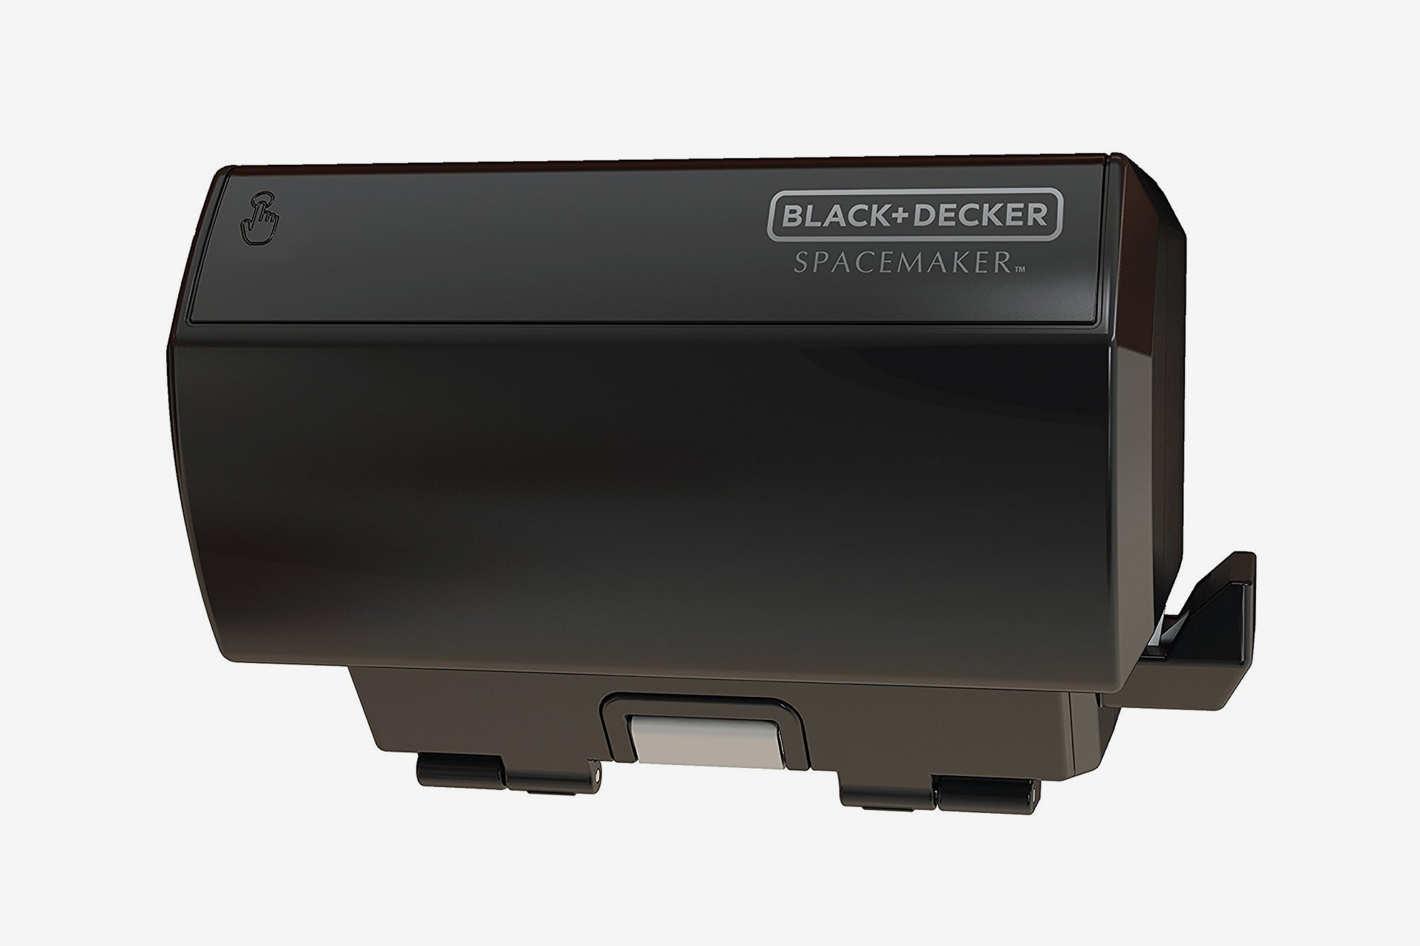 Black & Decker Spacemaker Multi-Purpose Can Opener